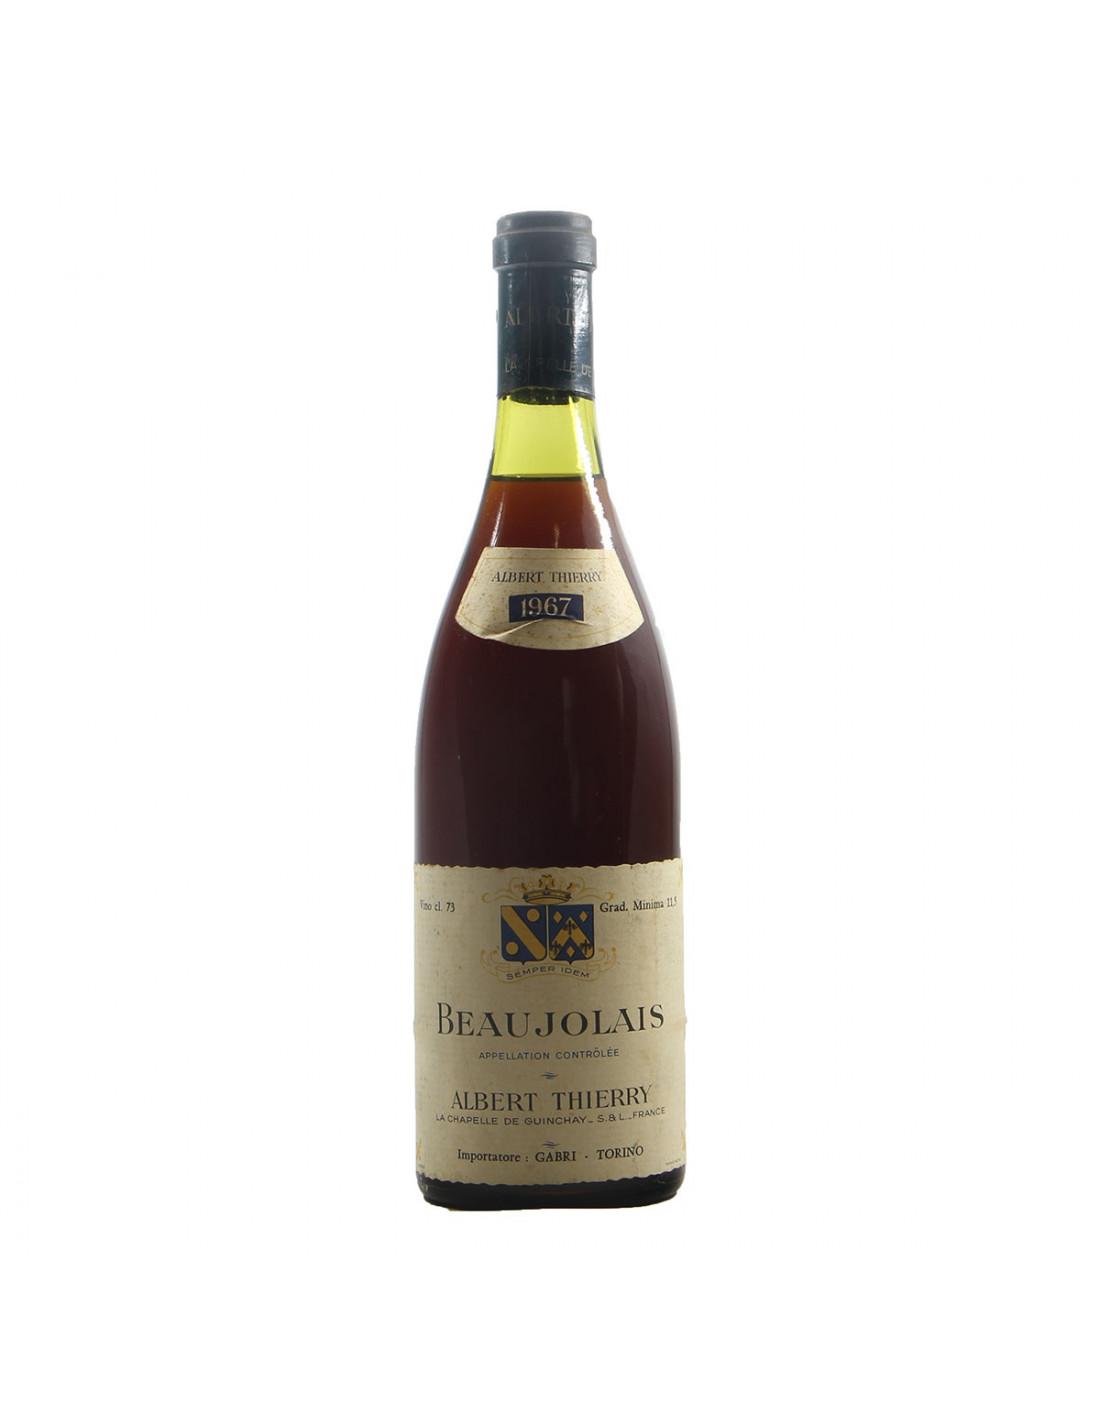 Albert Thierry Beaujolais 1967 Grandi Bottiglie